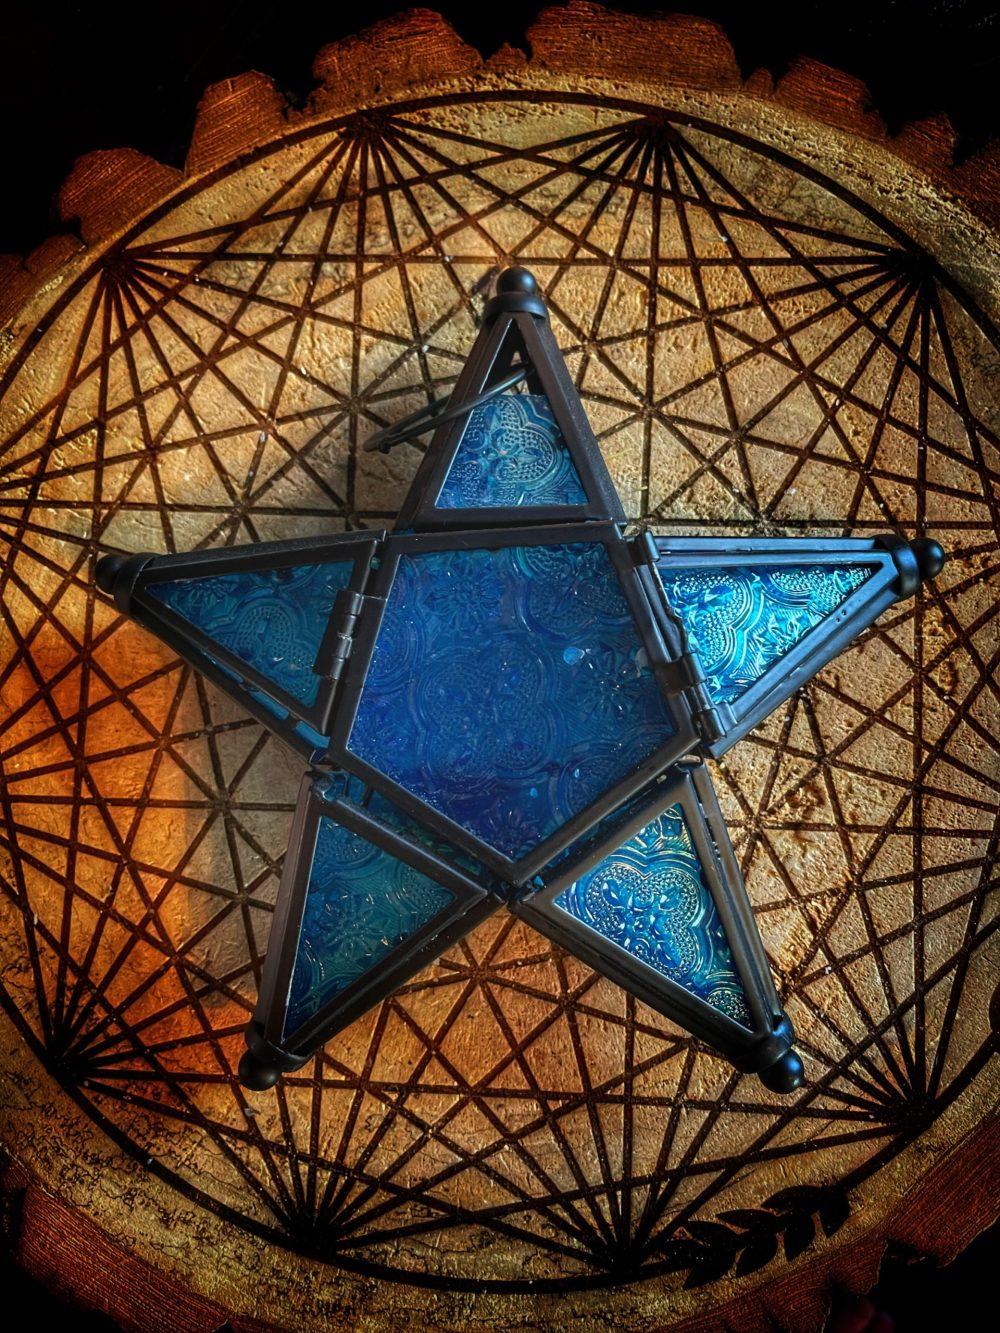 Old World Star Whisp Lantern